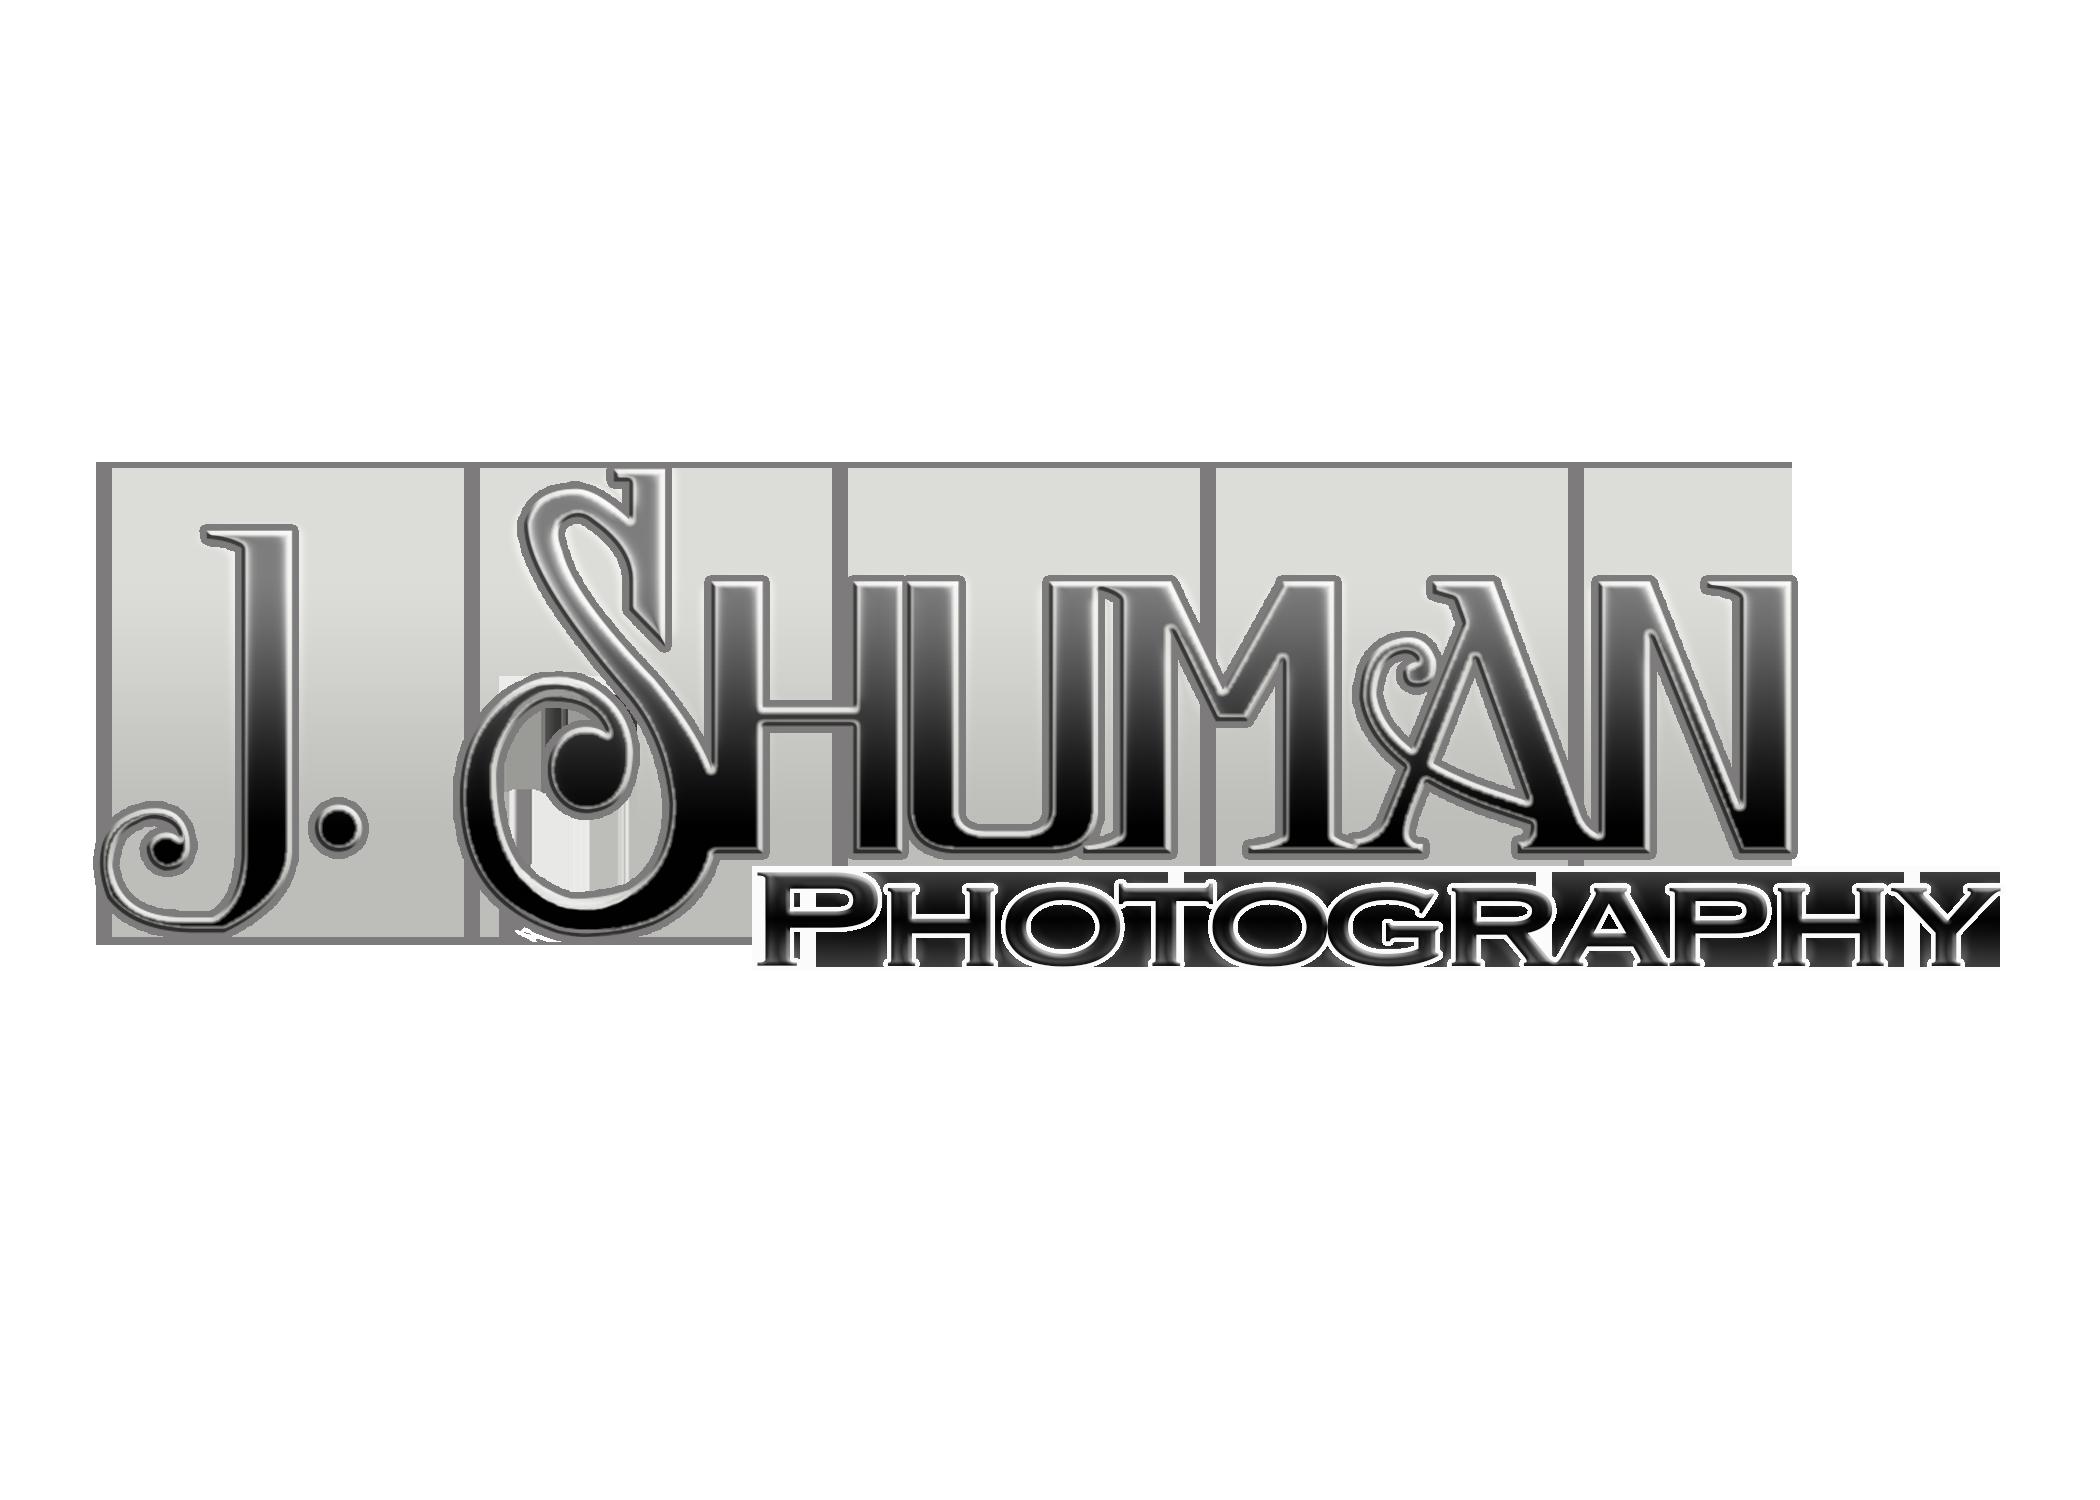 J. Shuman Photography 2021